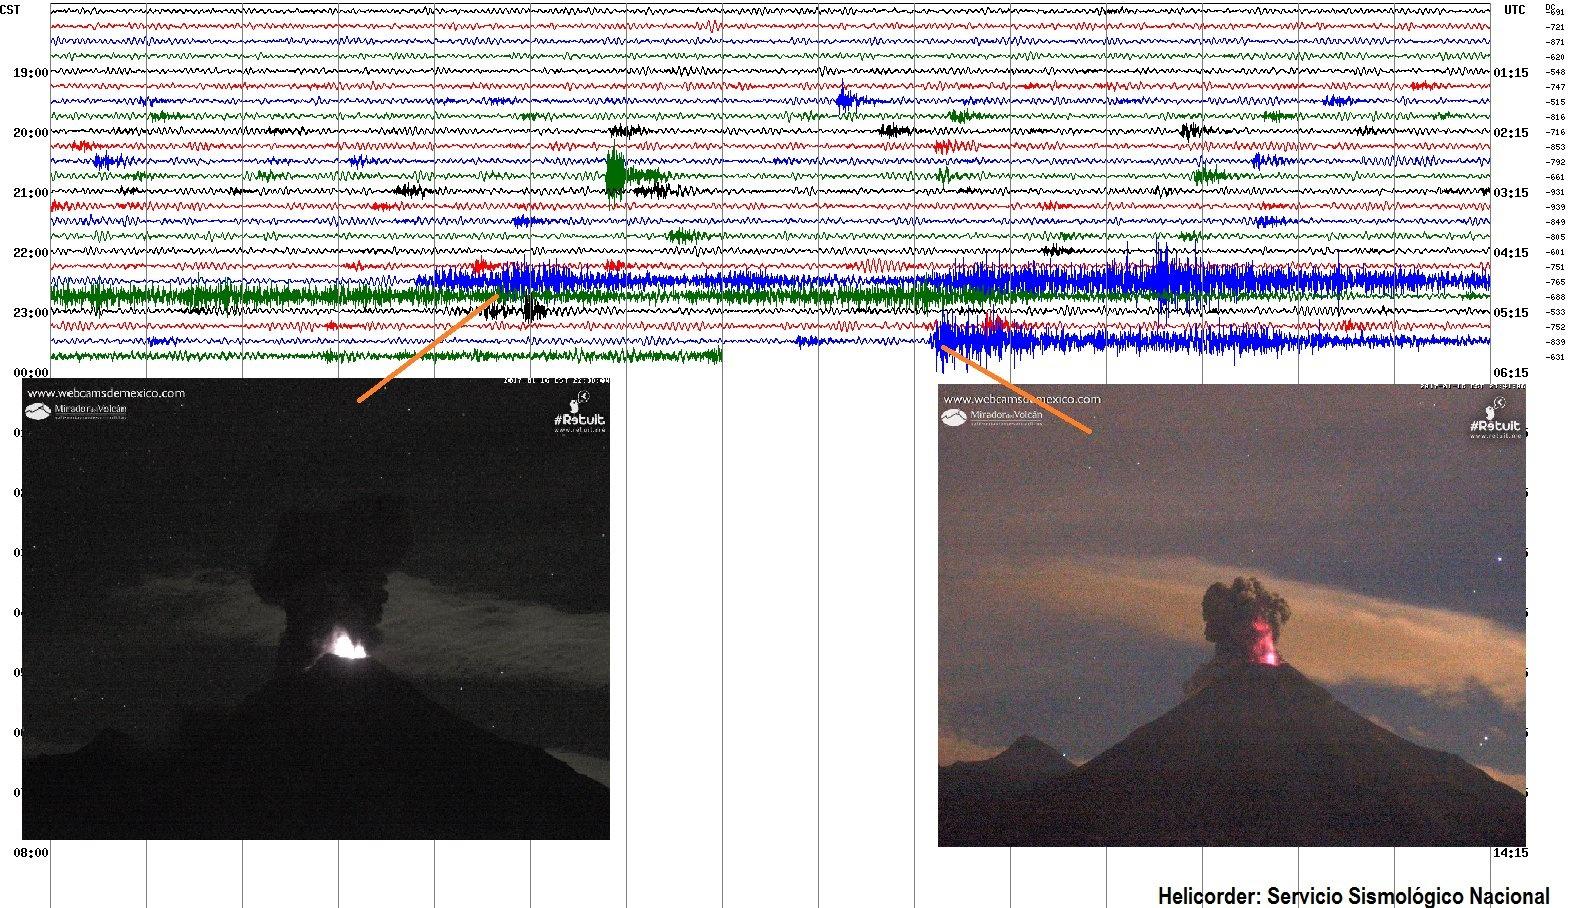 colima eruption, volcanic eruption january 2017, latest volcano eruptions, latest volcanic eruption, volcano eruptions worldwide